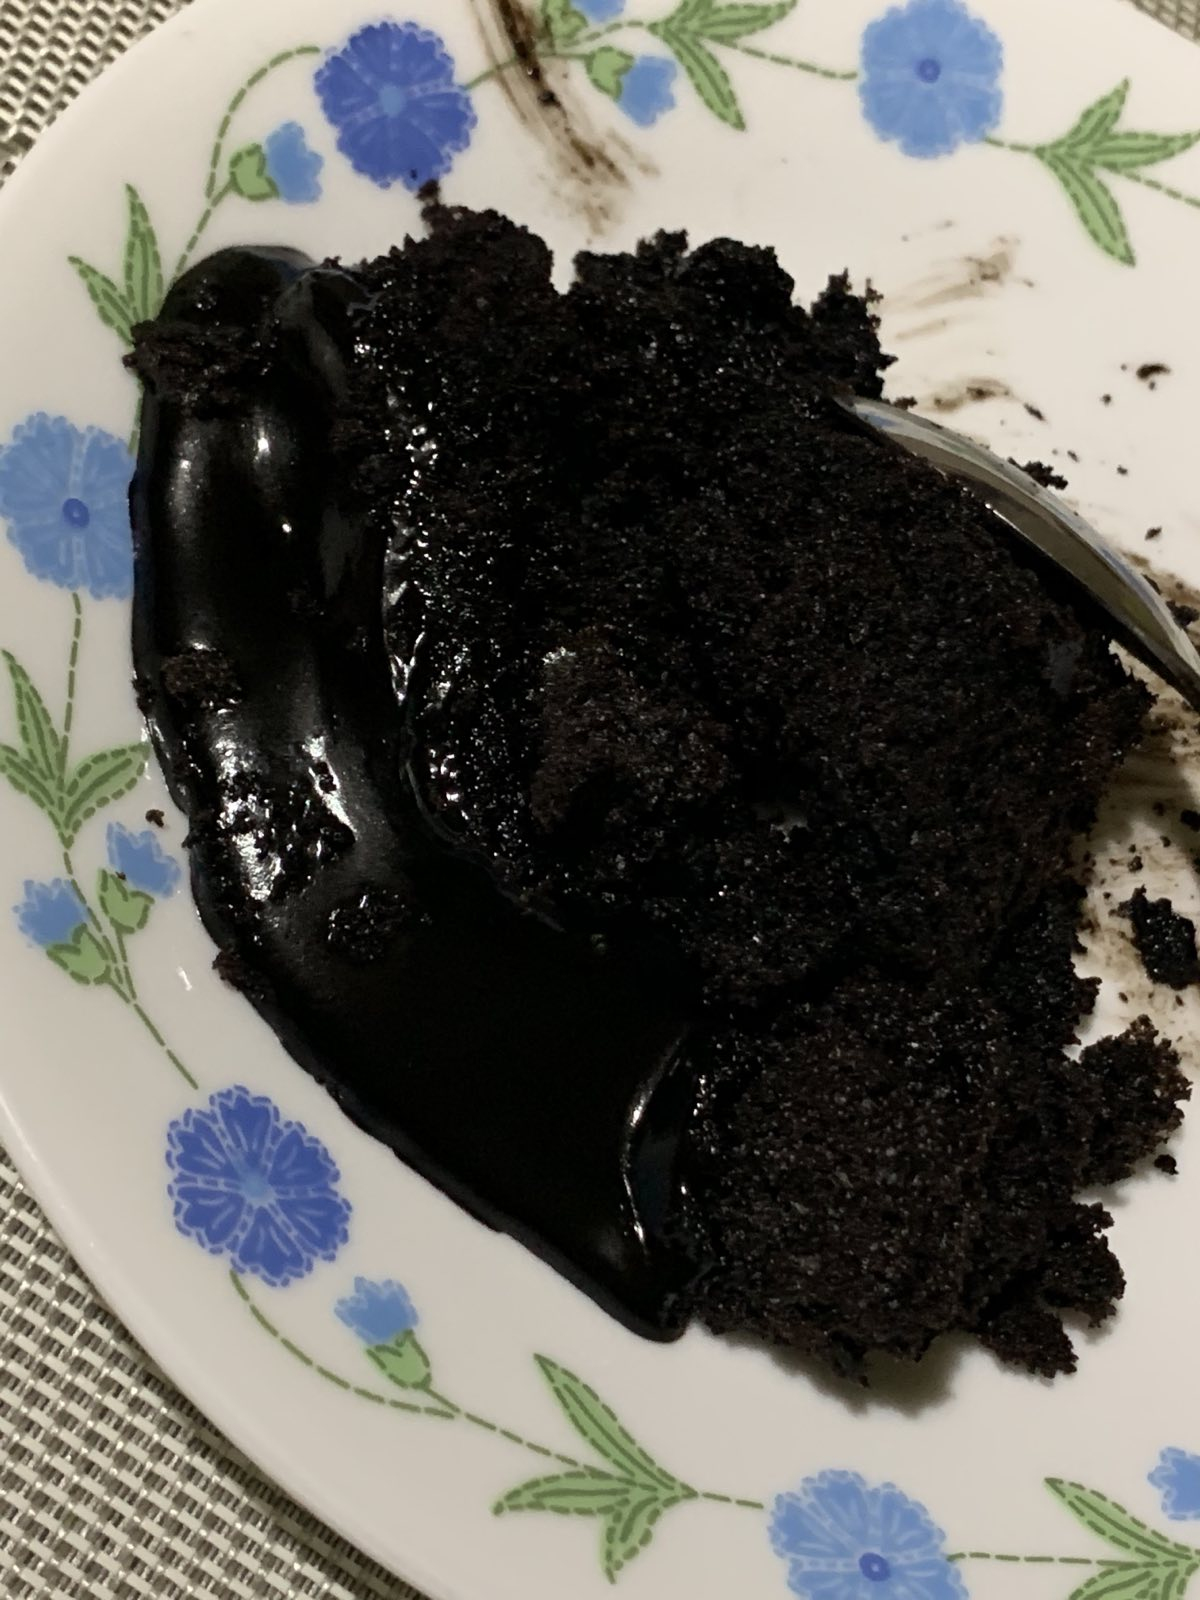 A sticky slice of Big Al's chocolate cake on a saucer.